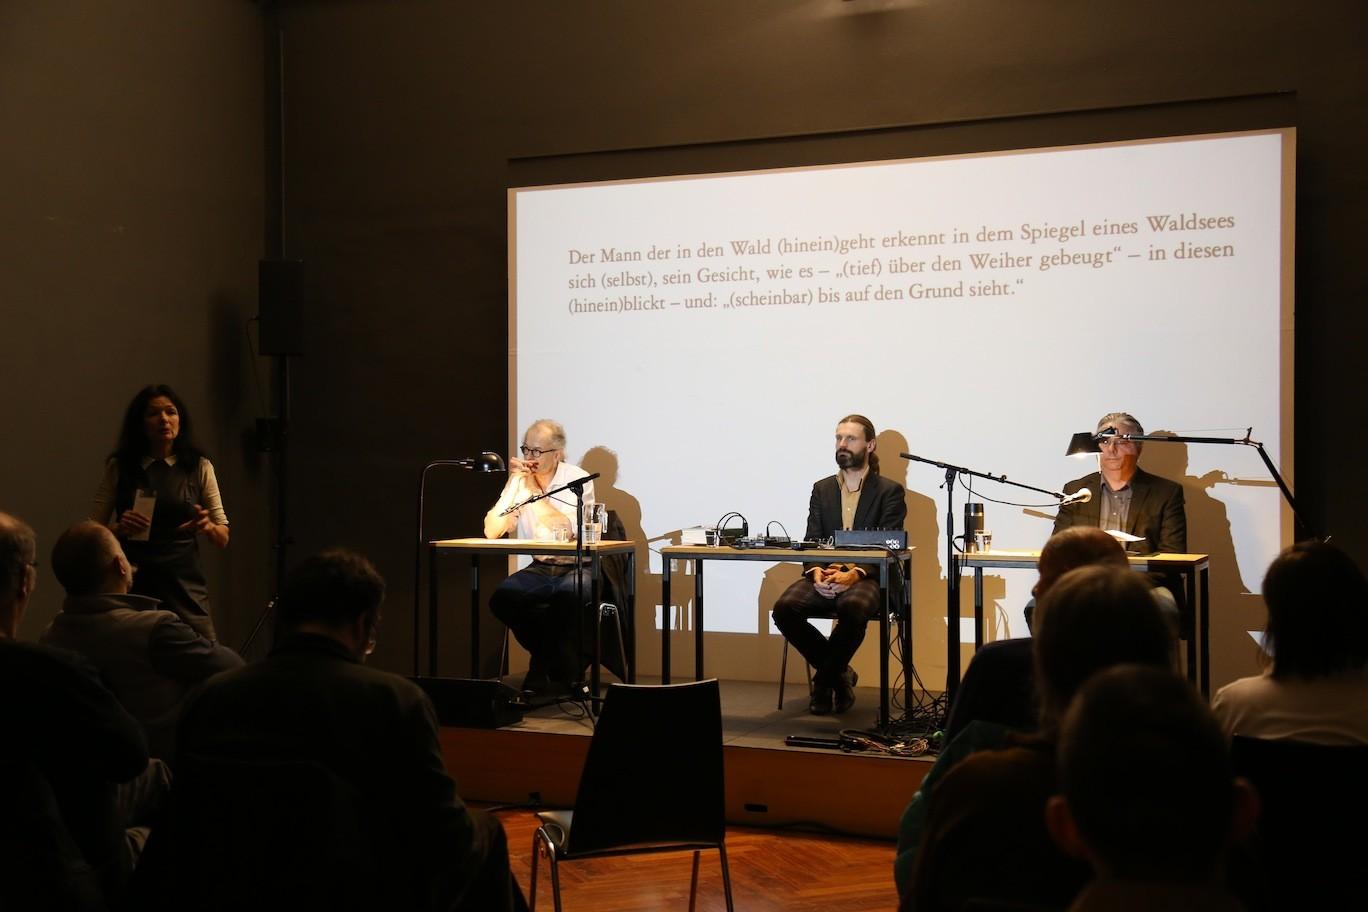 Birgit Pölzl, Sebastian Kiefer, Martin Rumori, Ulrich Schlotmann © Teresa Schnider